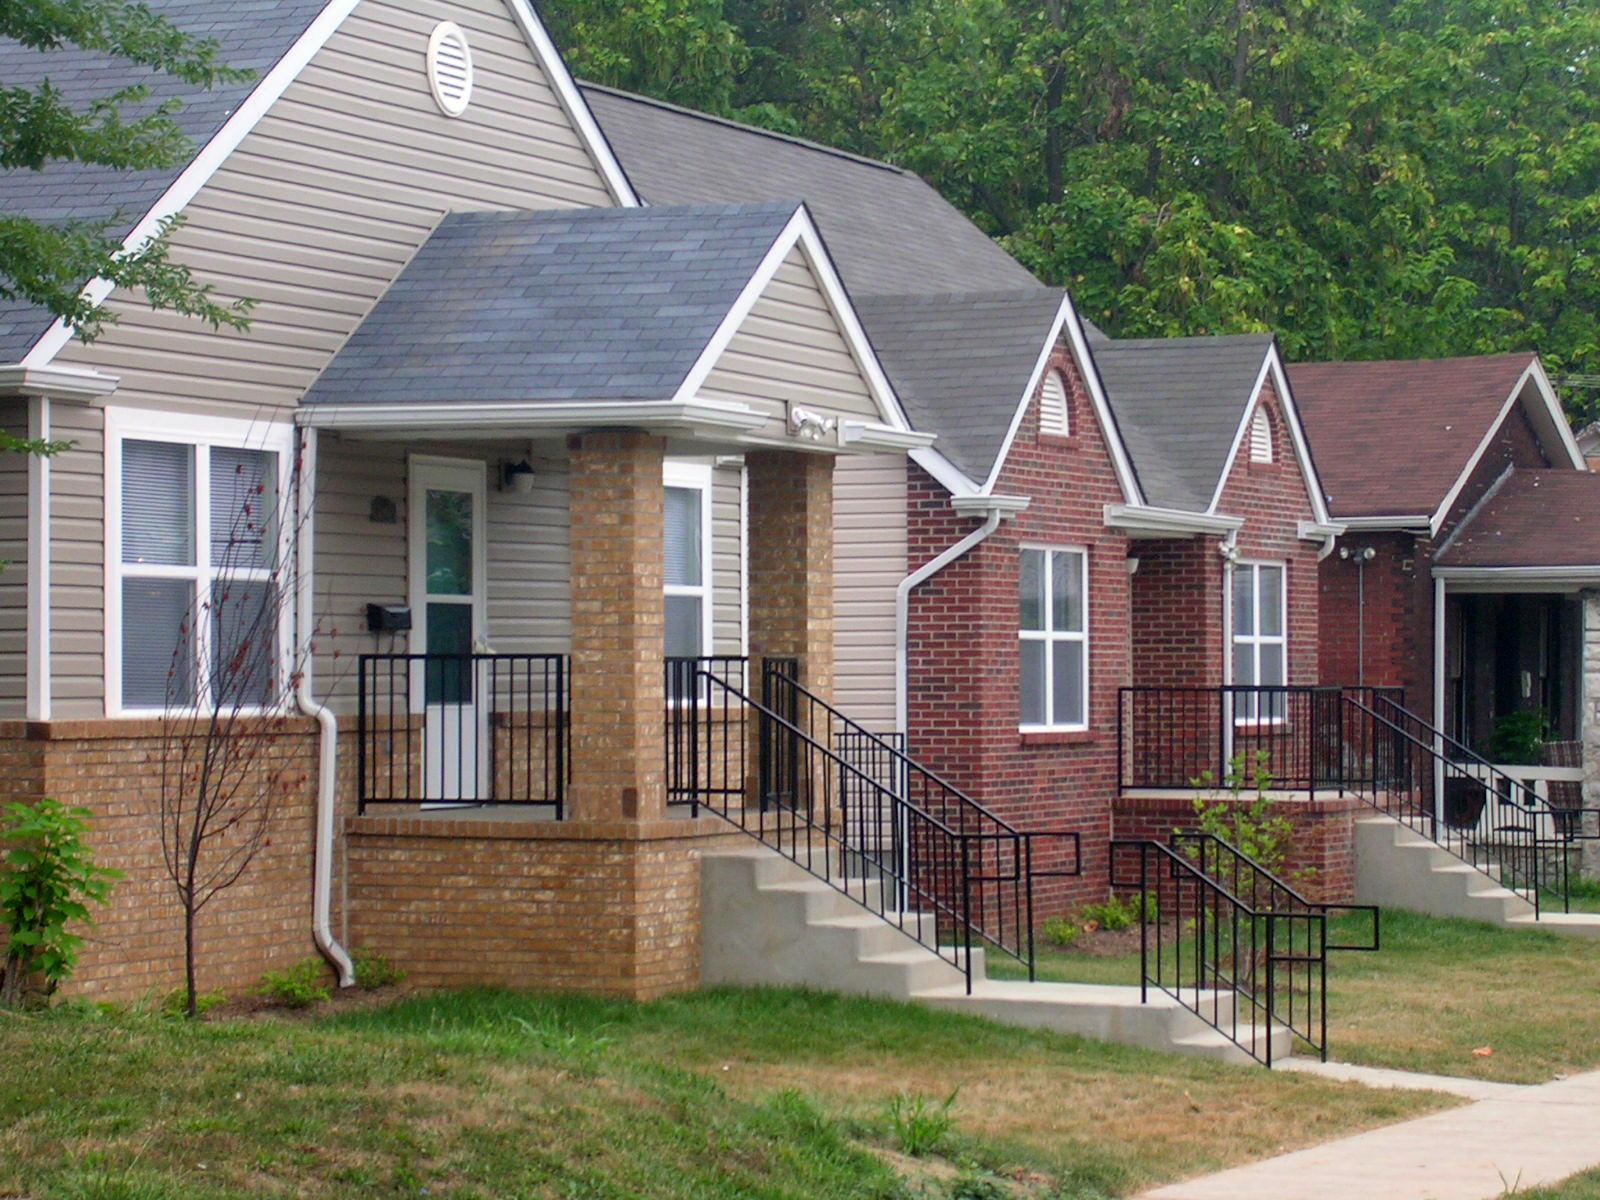 Lillian Park Homes I & II